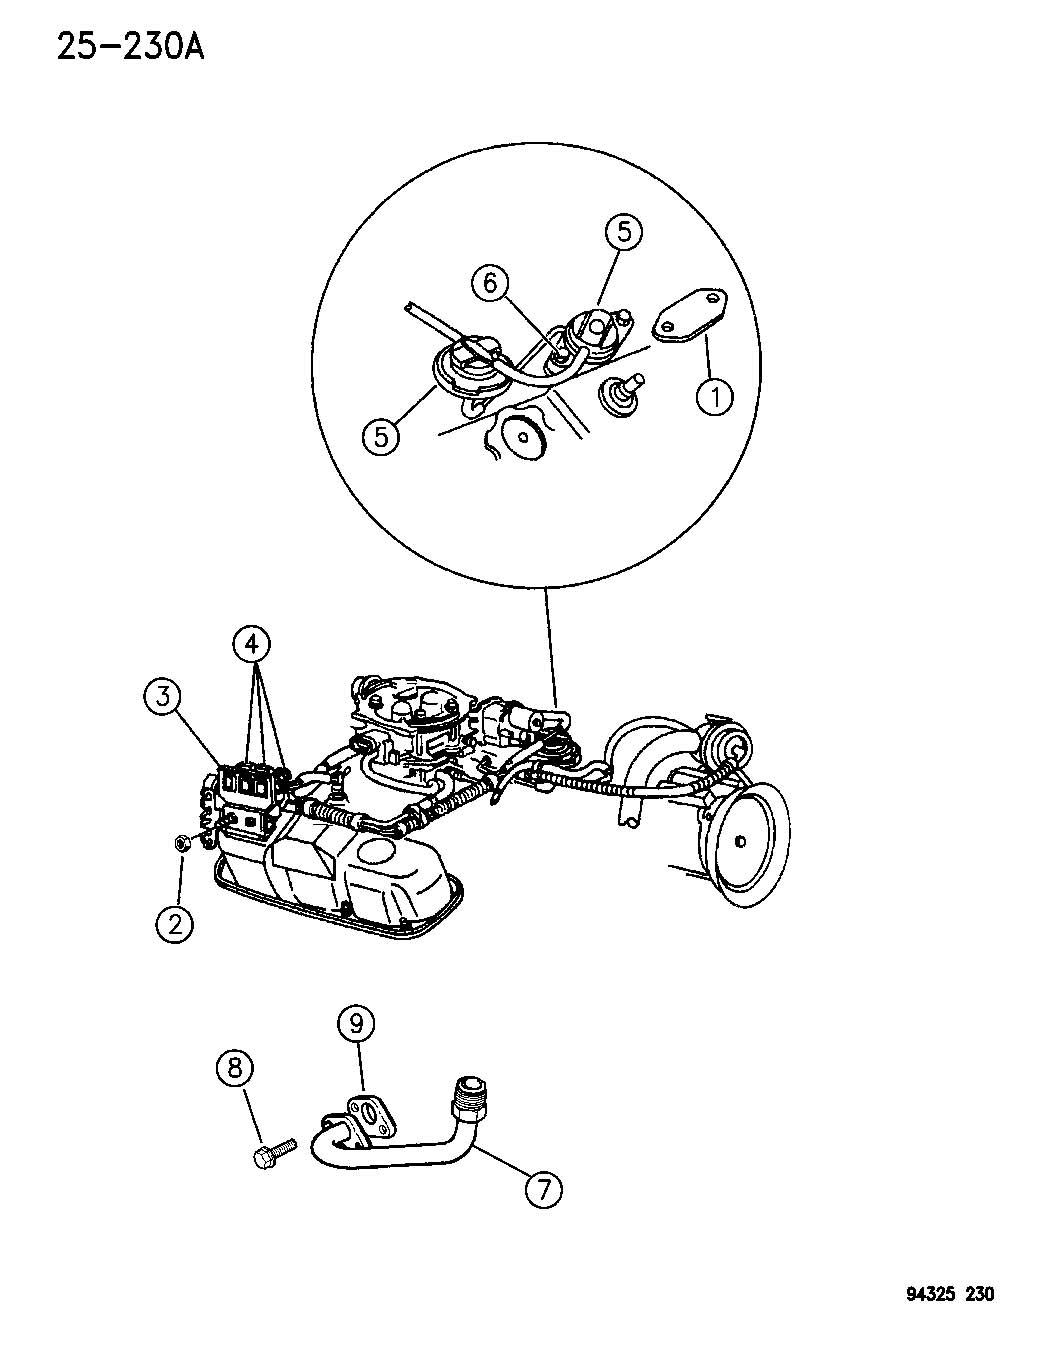 Dodge Dakota Solenoid Duty Cycle Purge Pajgh Pajgc Dot